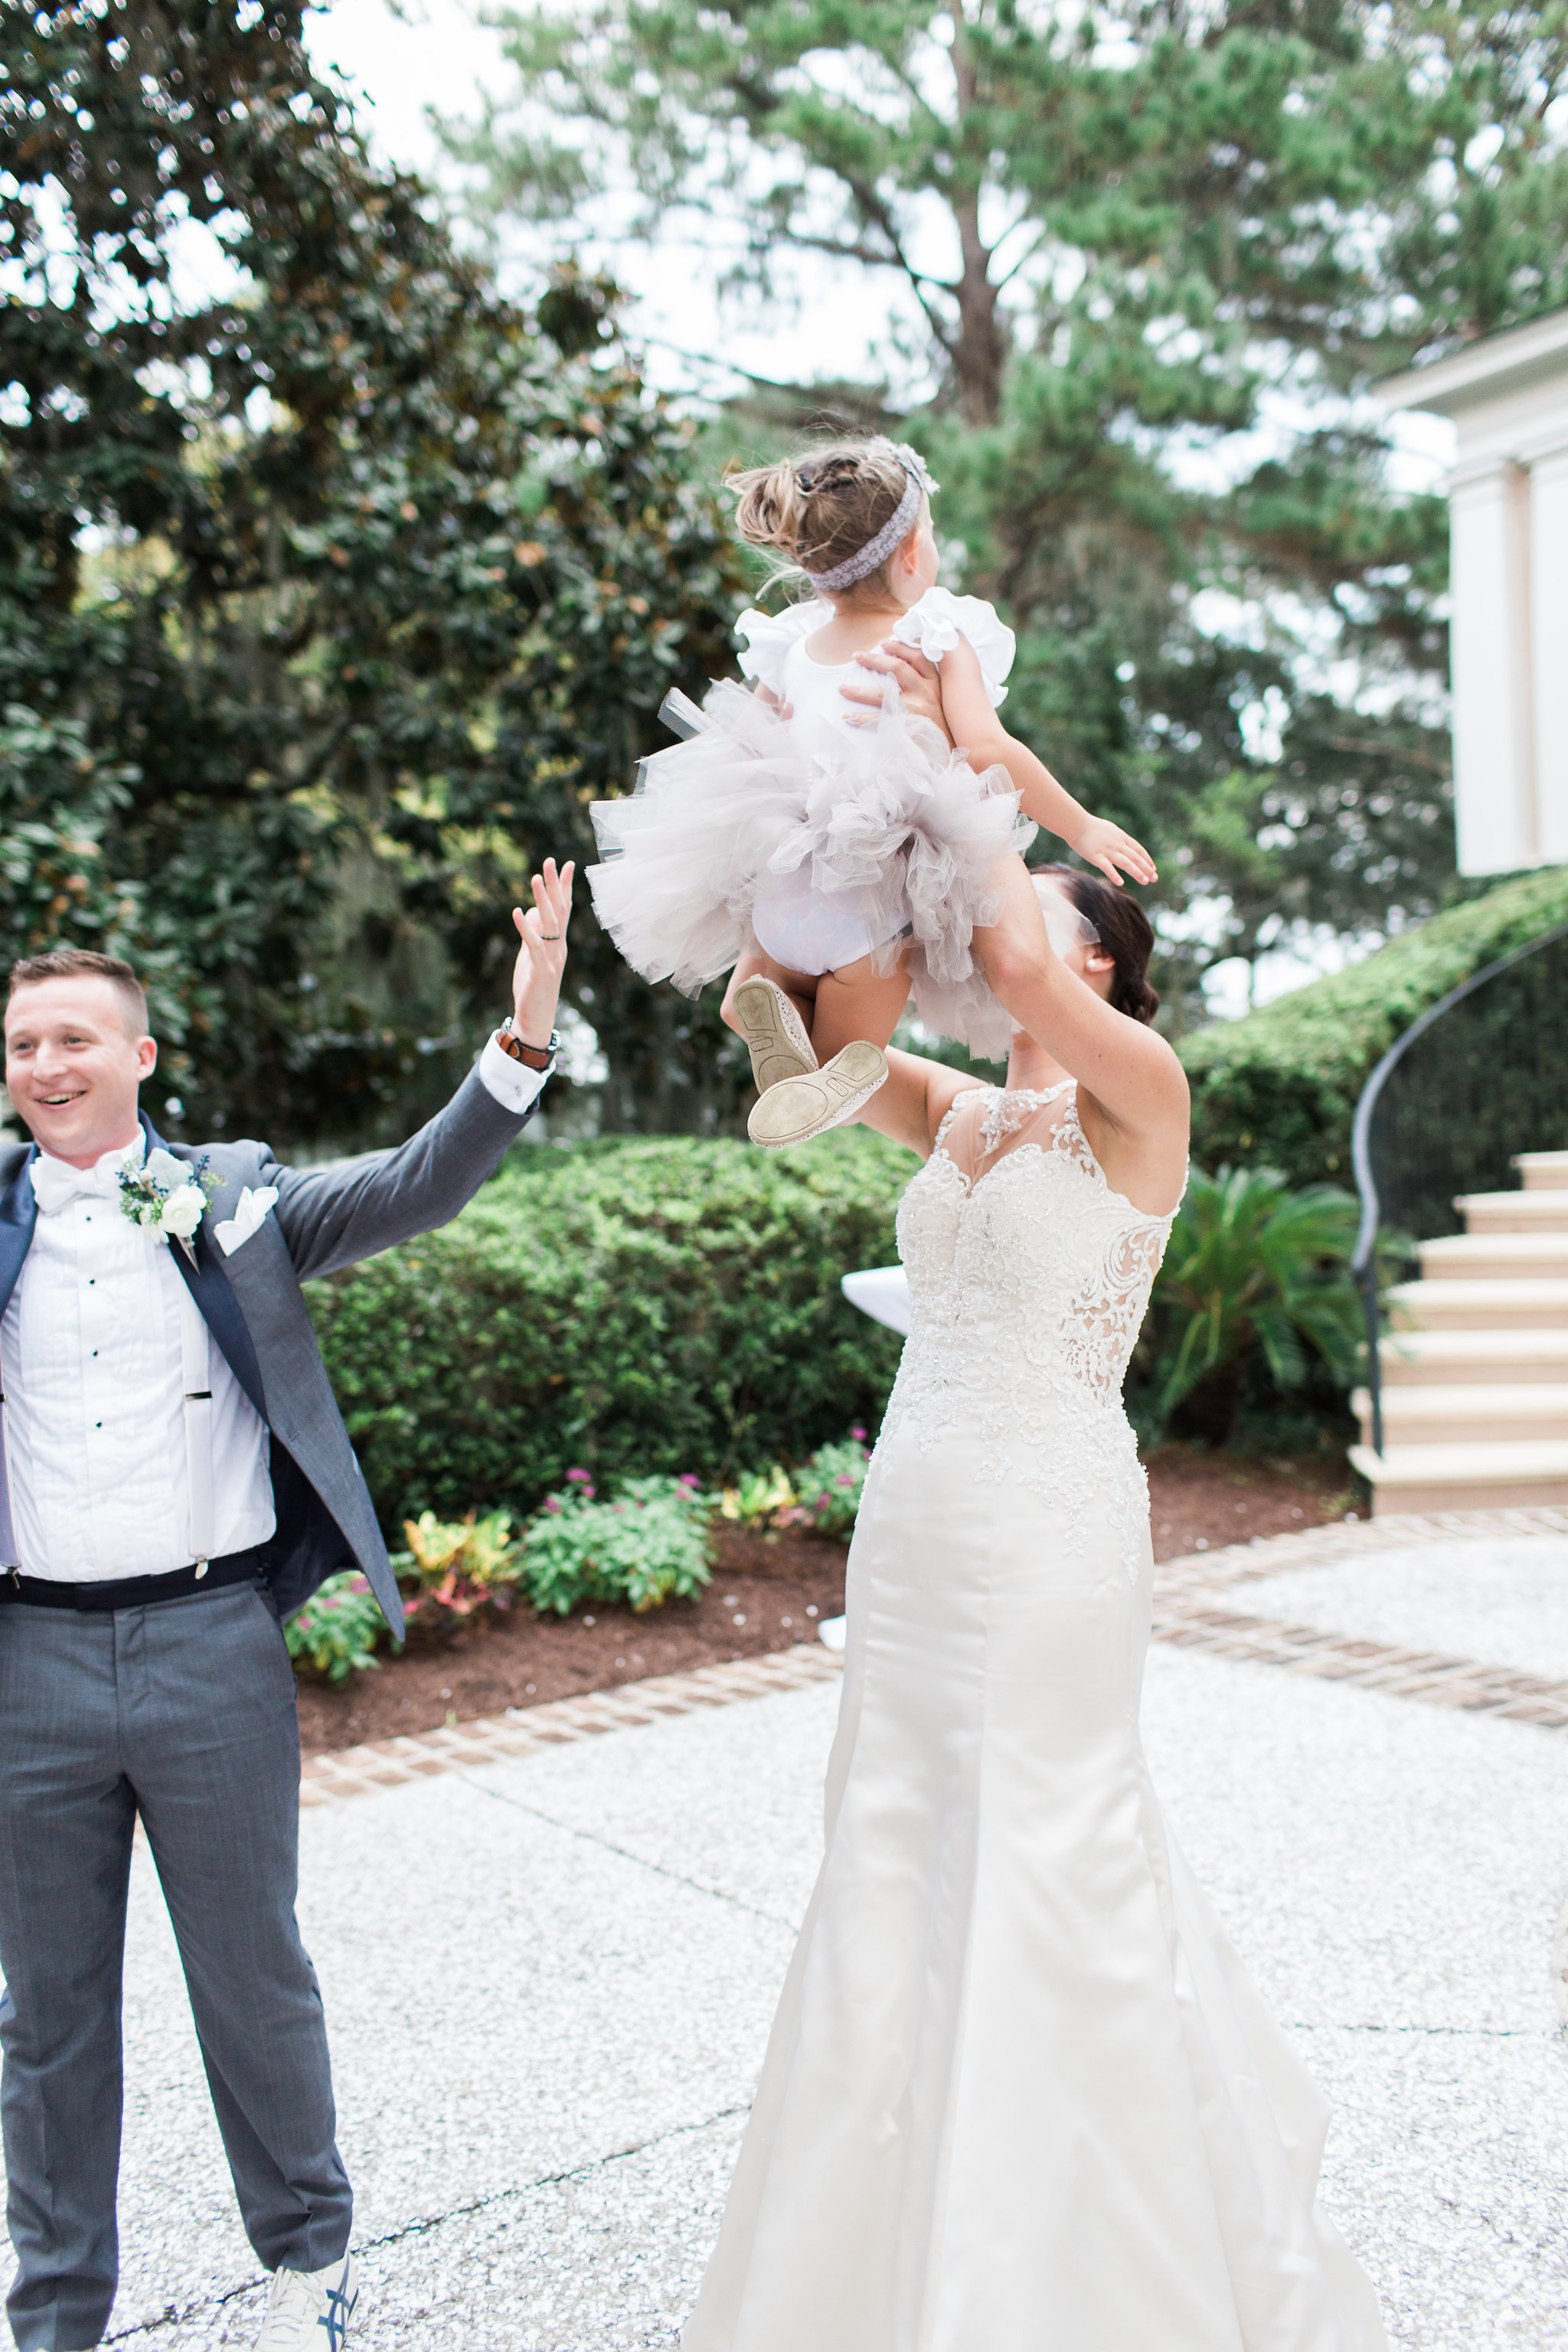 apt-b-photography-lauren-graham-oldfield-wedding-south-carolina-wedding-photographer-savannah-wedding-lowcountry-wedding-coastal-wedding-navy-wedding-flowergirl-tutu-30.JPG